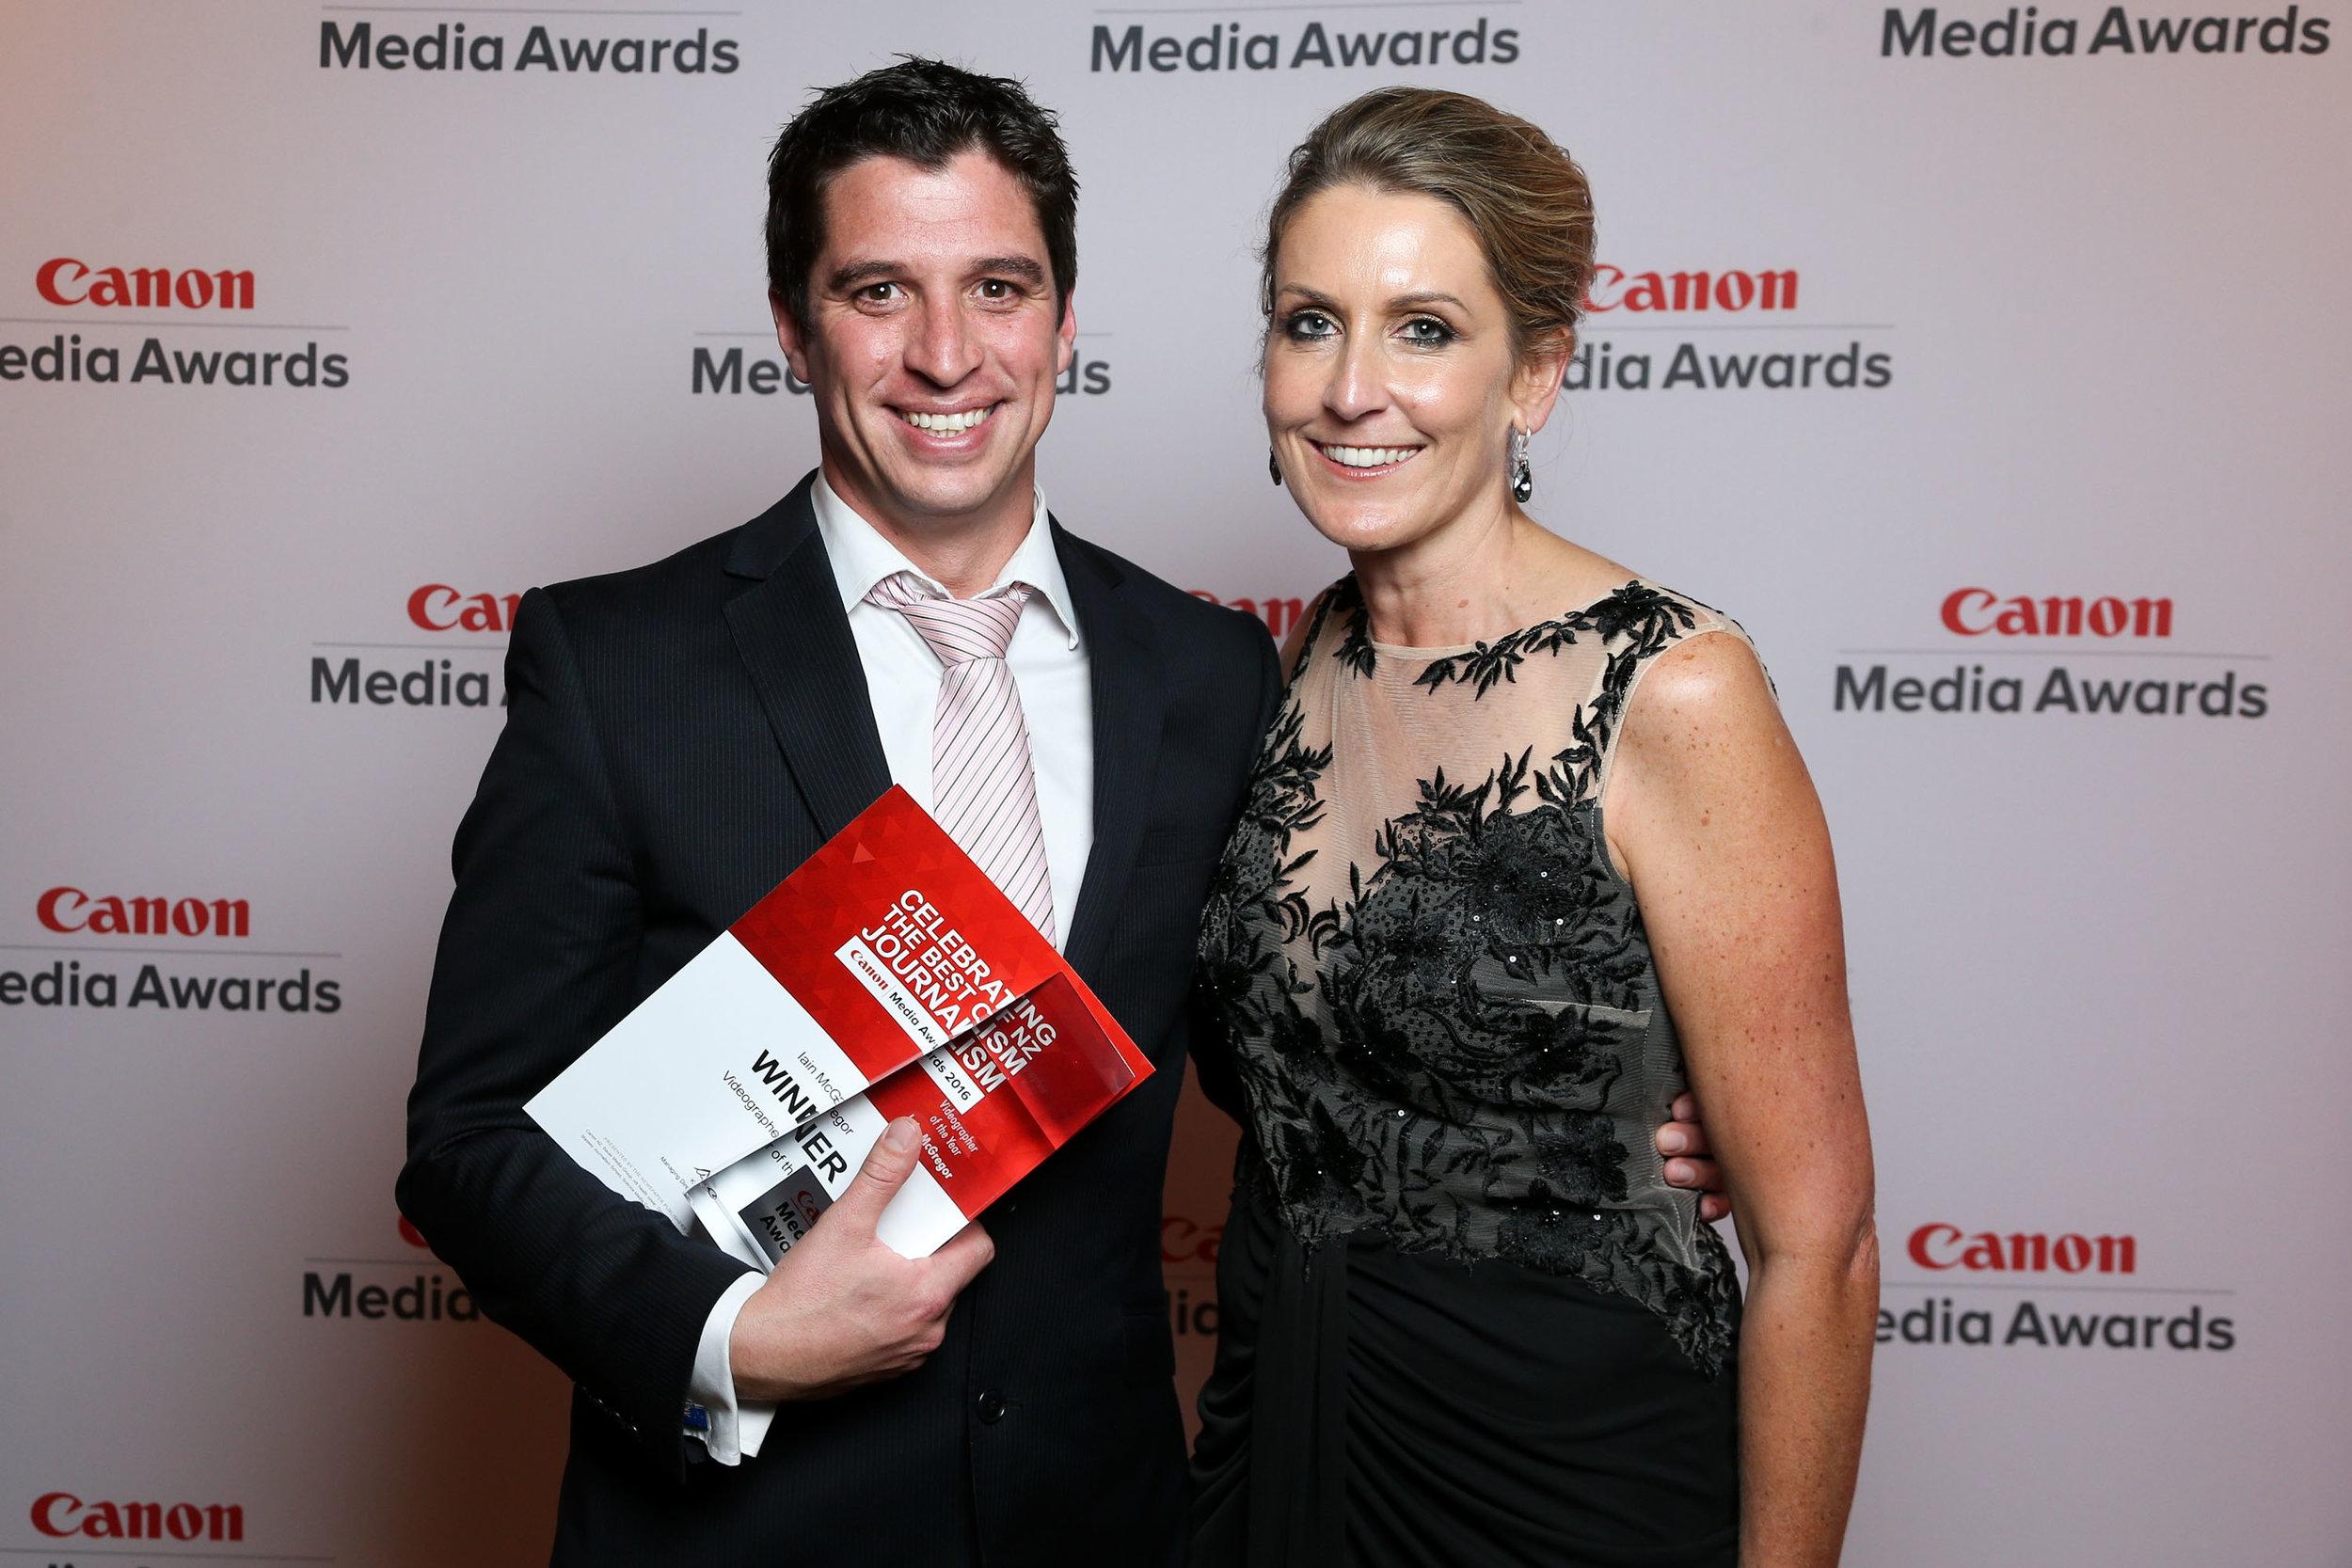 160520_Canon_Media_Awards_31.JPG